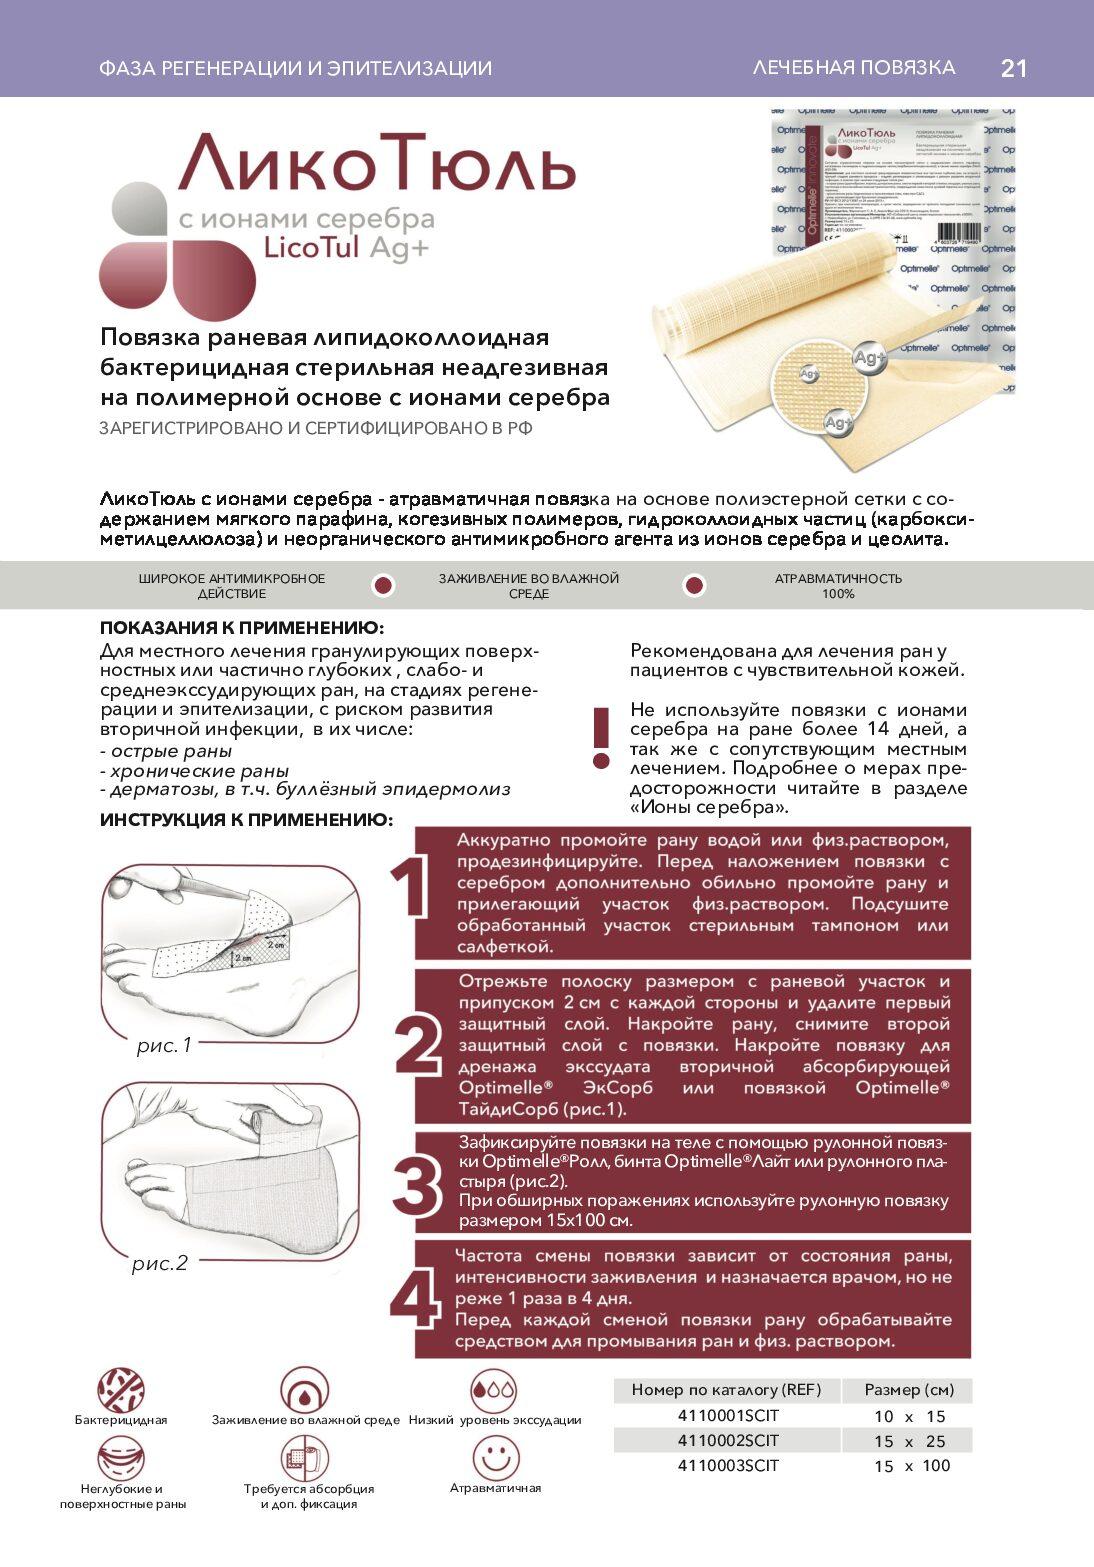 продукции Optimelle2 1 60 21 pdf